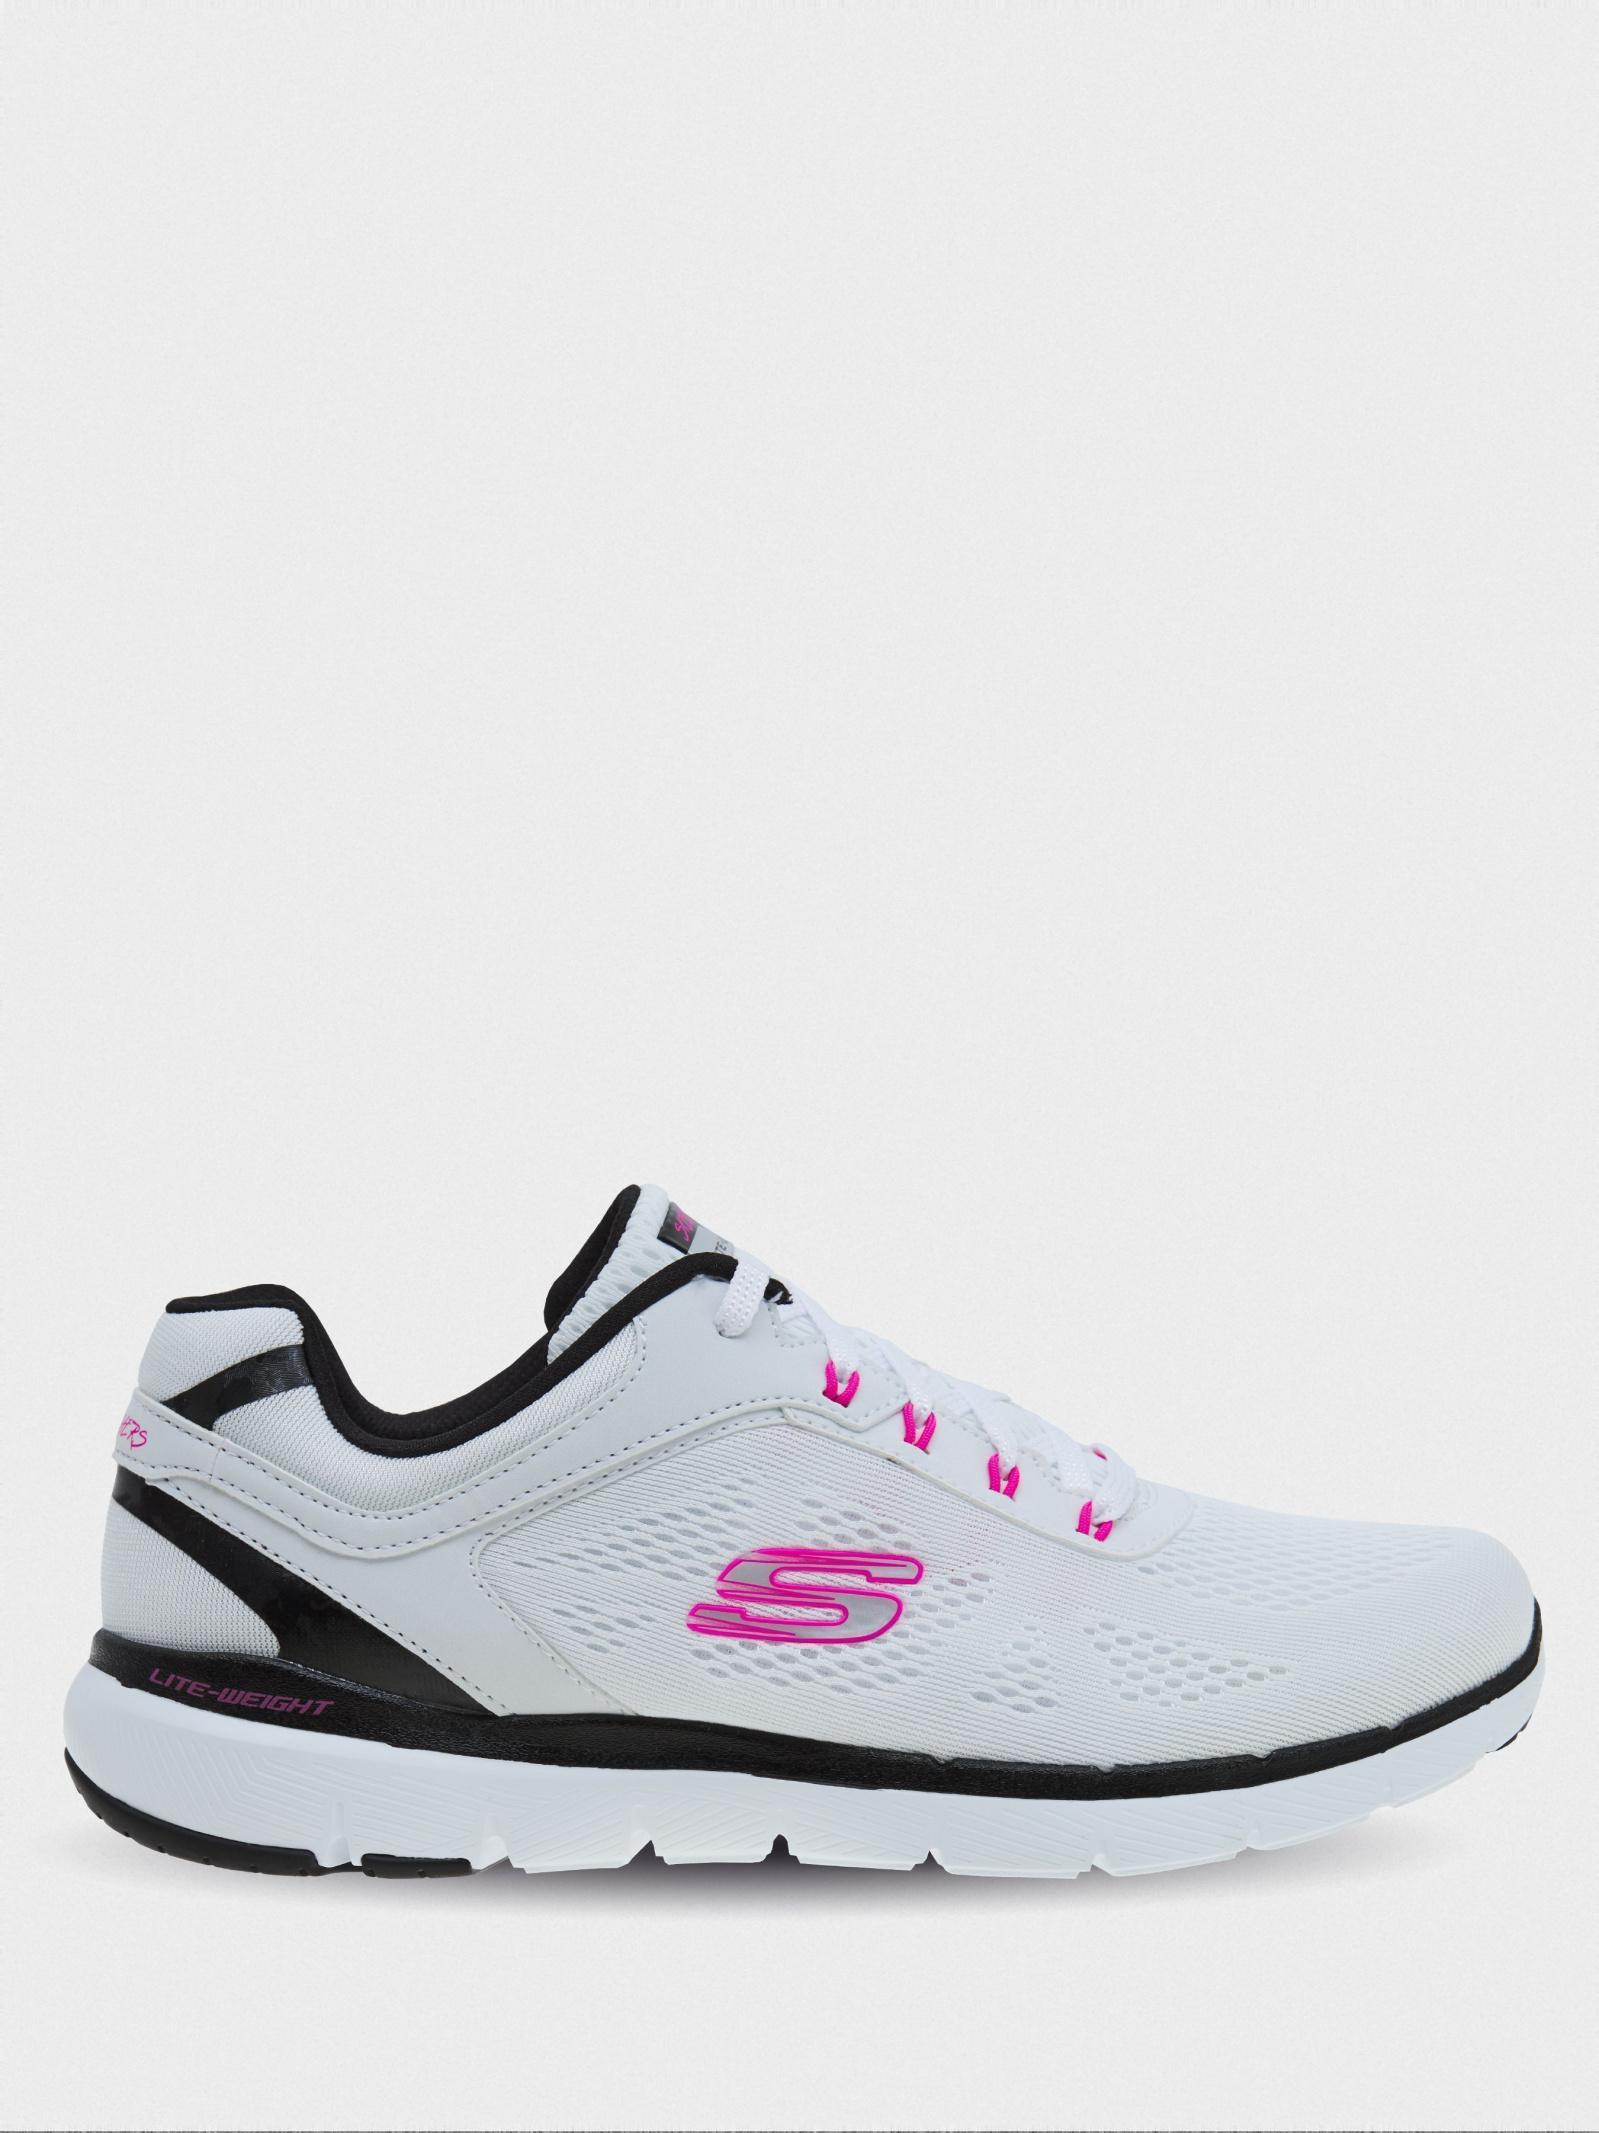 Кроссовки для женщин Skechers Sport Womens KW5678 продажа, 2017